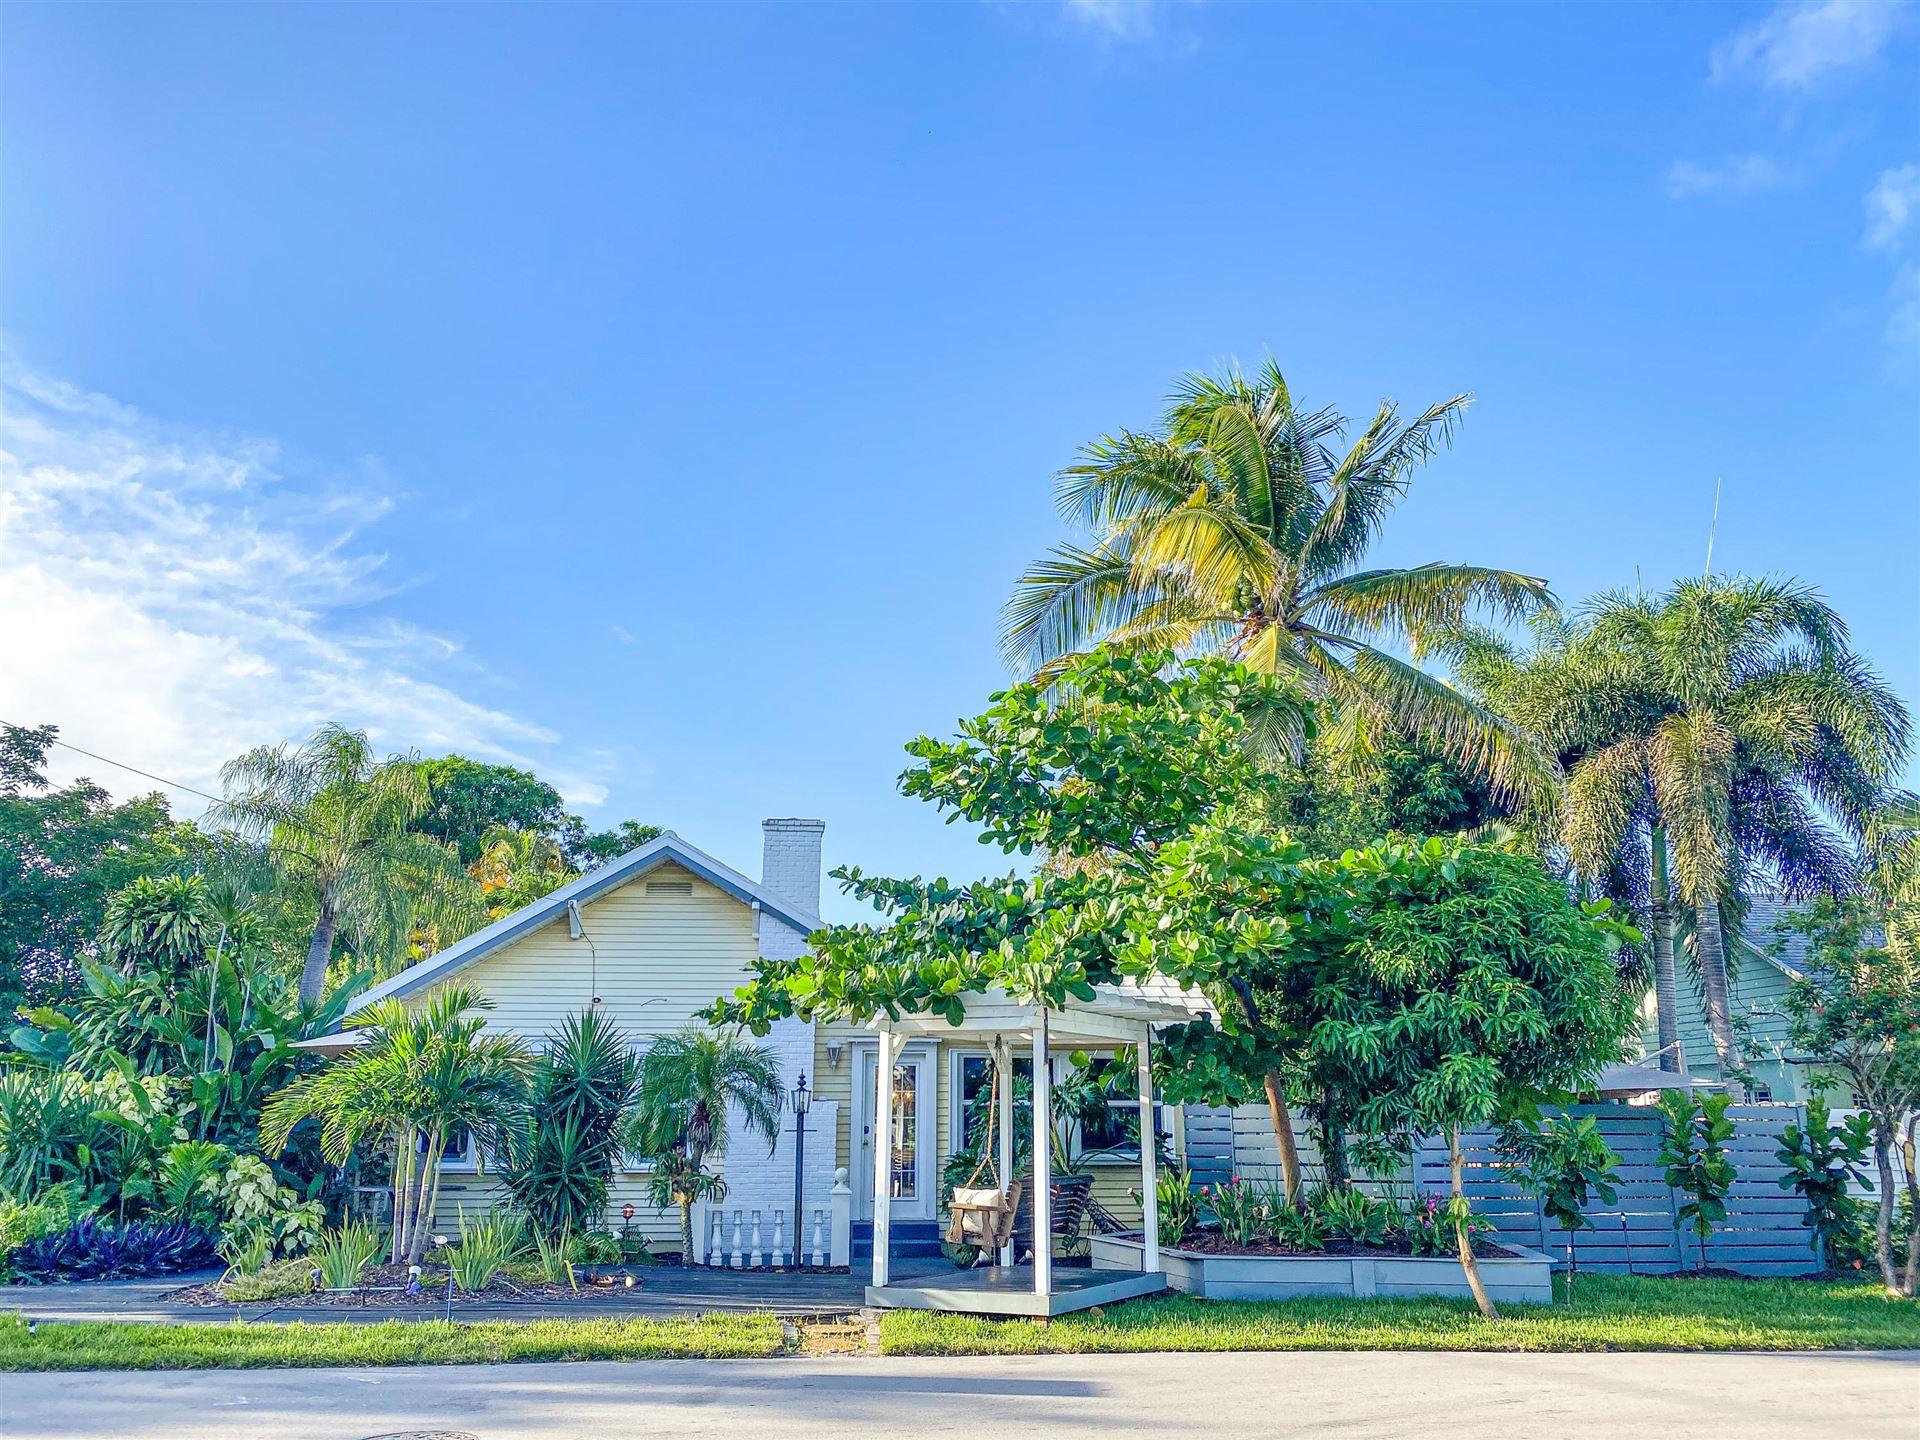 700 NE 17th Avenue, Fort Lauderdale, FL 33304 - #: RX-10642040